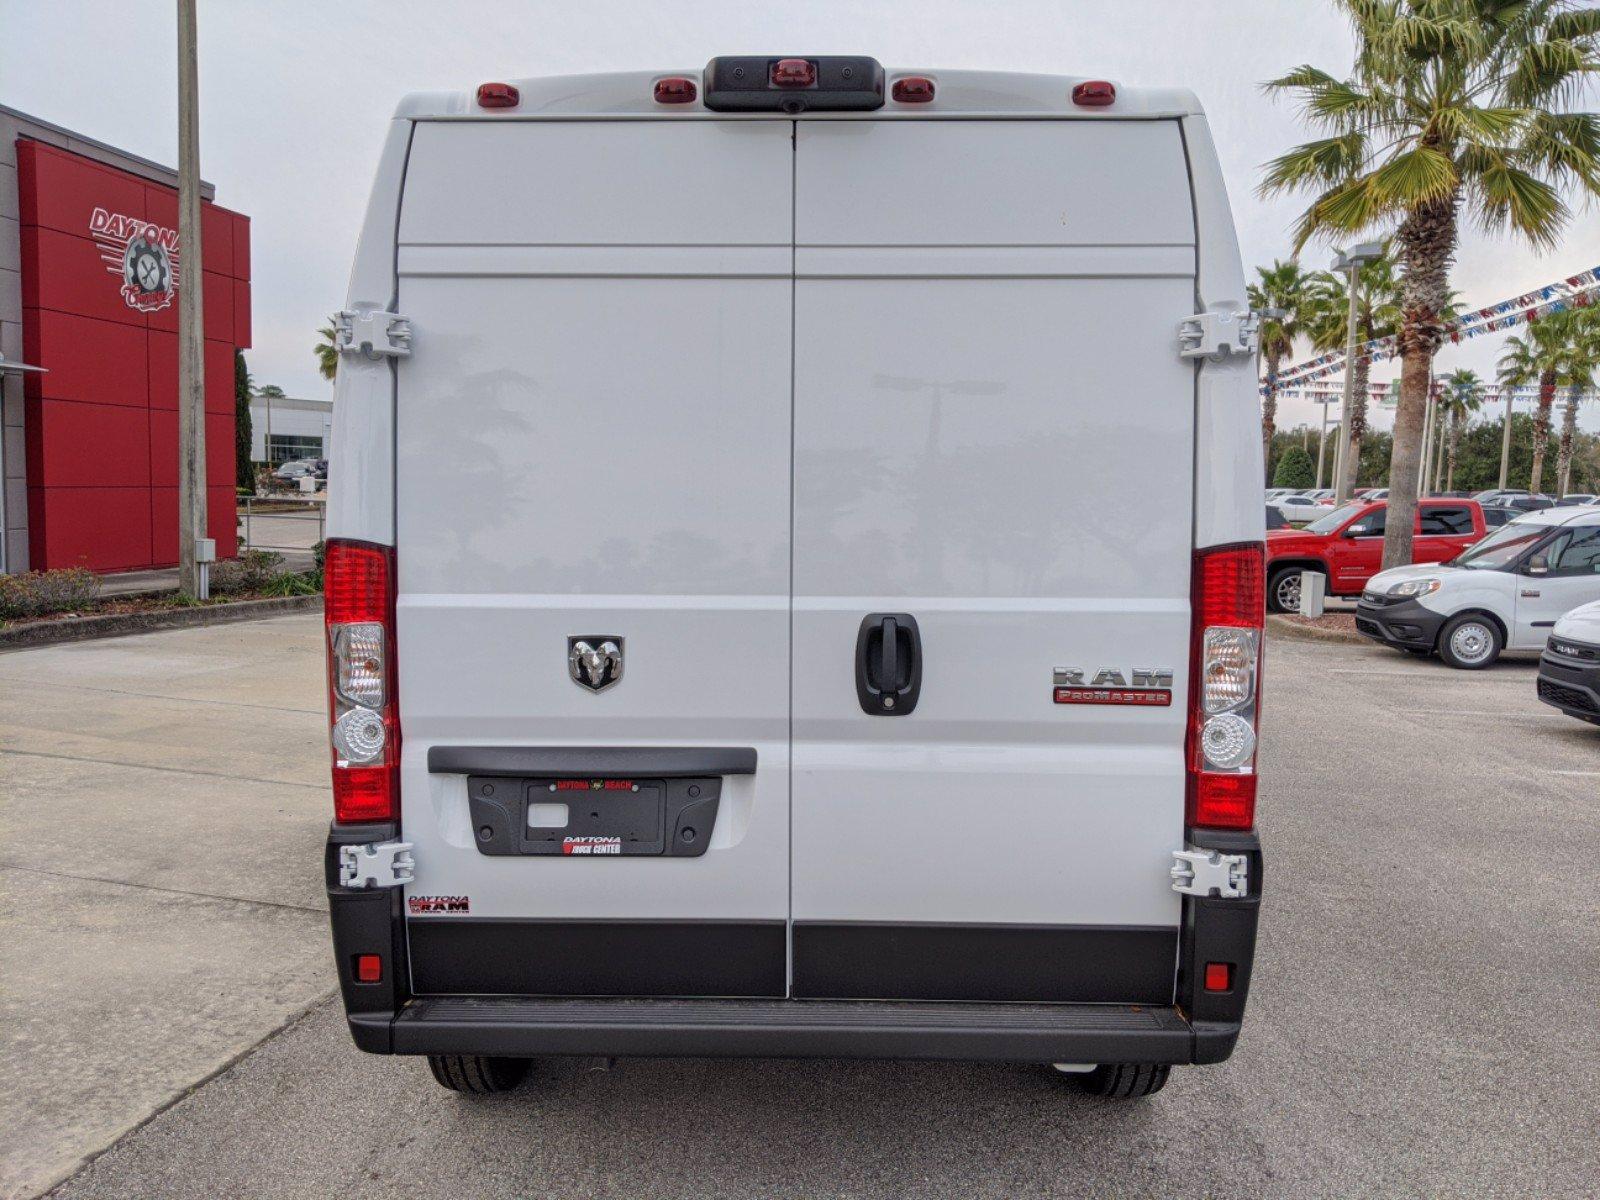 2021 Ram ProMaster 3500 FWD, Empty Cargo Van #R21178 - photo 4